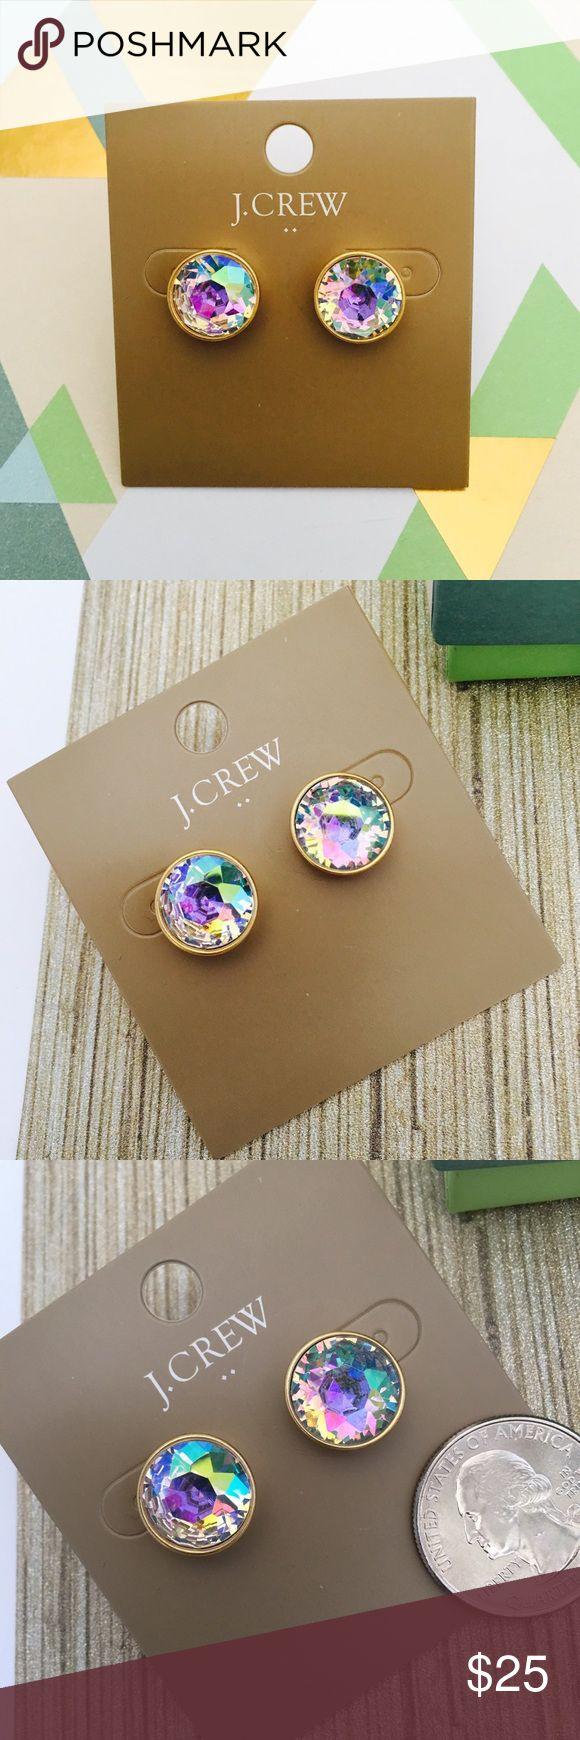 "J. Crew Iridescent Dot Earrings Gorgeous iridescent earrings. Factory item. Color: Buff Irridescent  * Zinc, glass stone, cubic zirconia. * Light gold ox plating. * 9/16""W. J. Crew Jewelry Earrings"